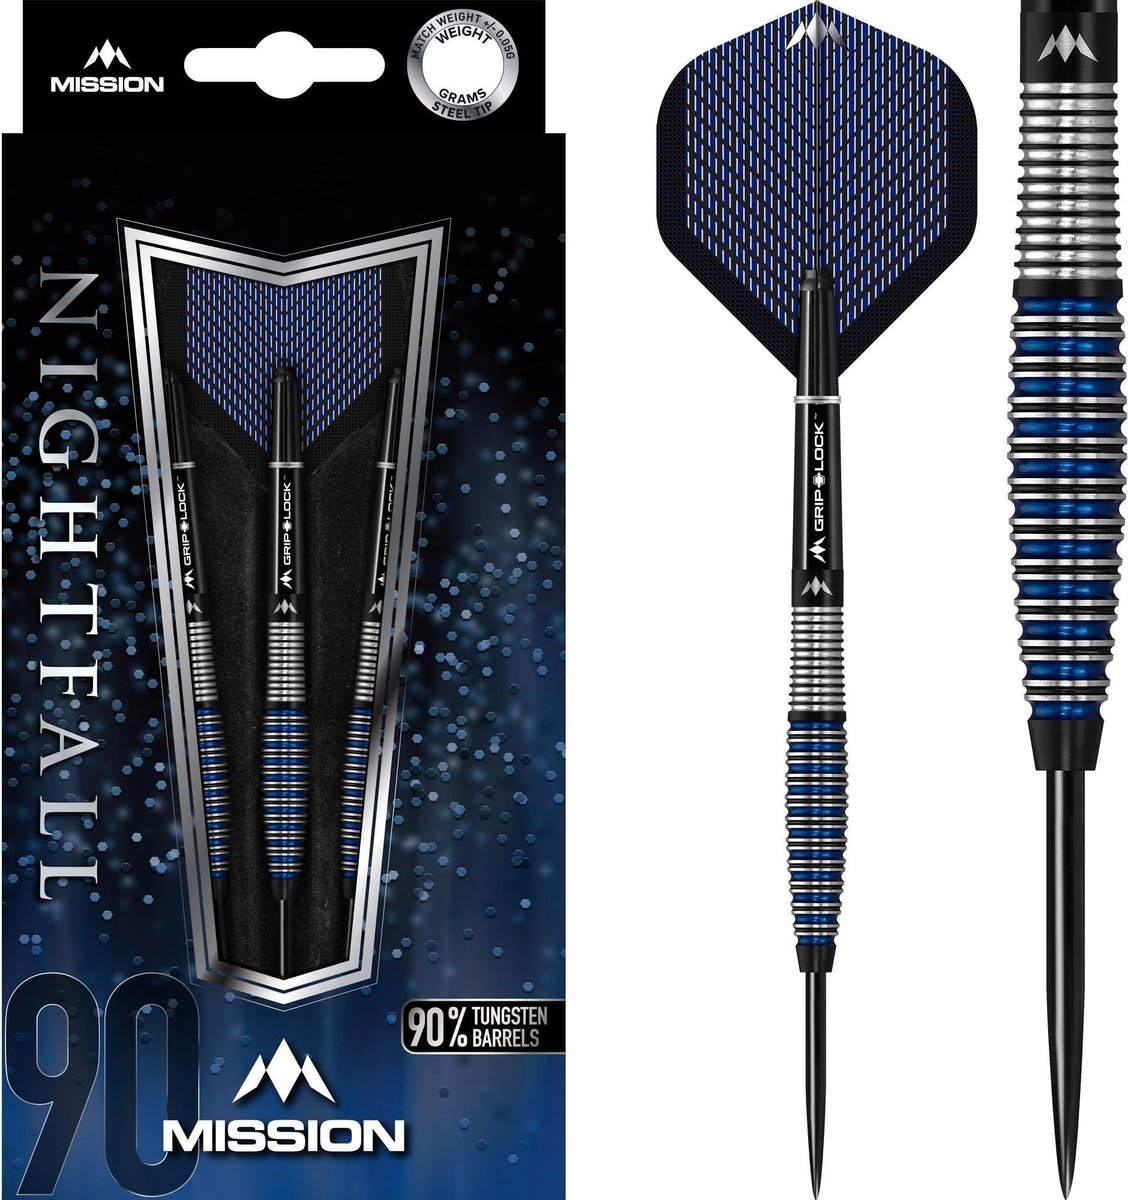 Mission Nightfall M4 90% - 26 Gram